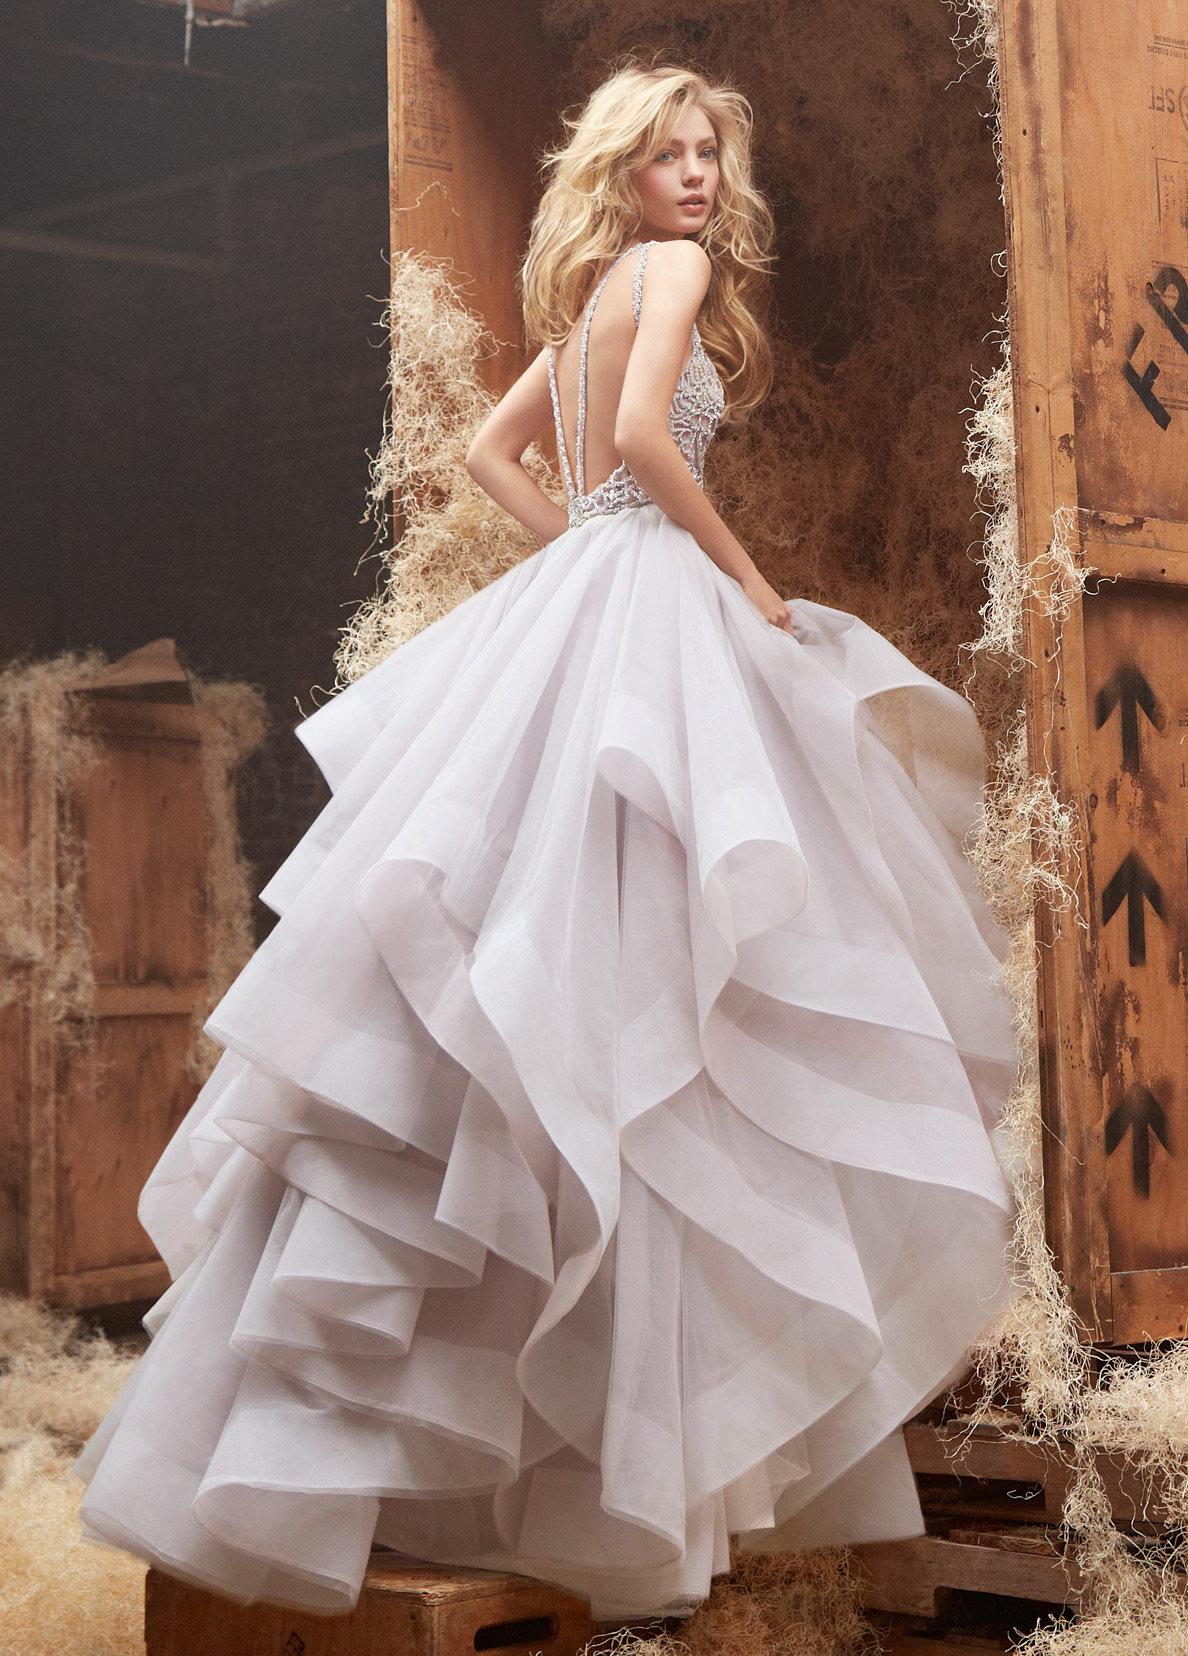 fad562c4c3 Hayley Paige Dress – Fashion dresses